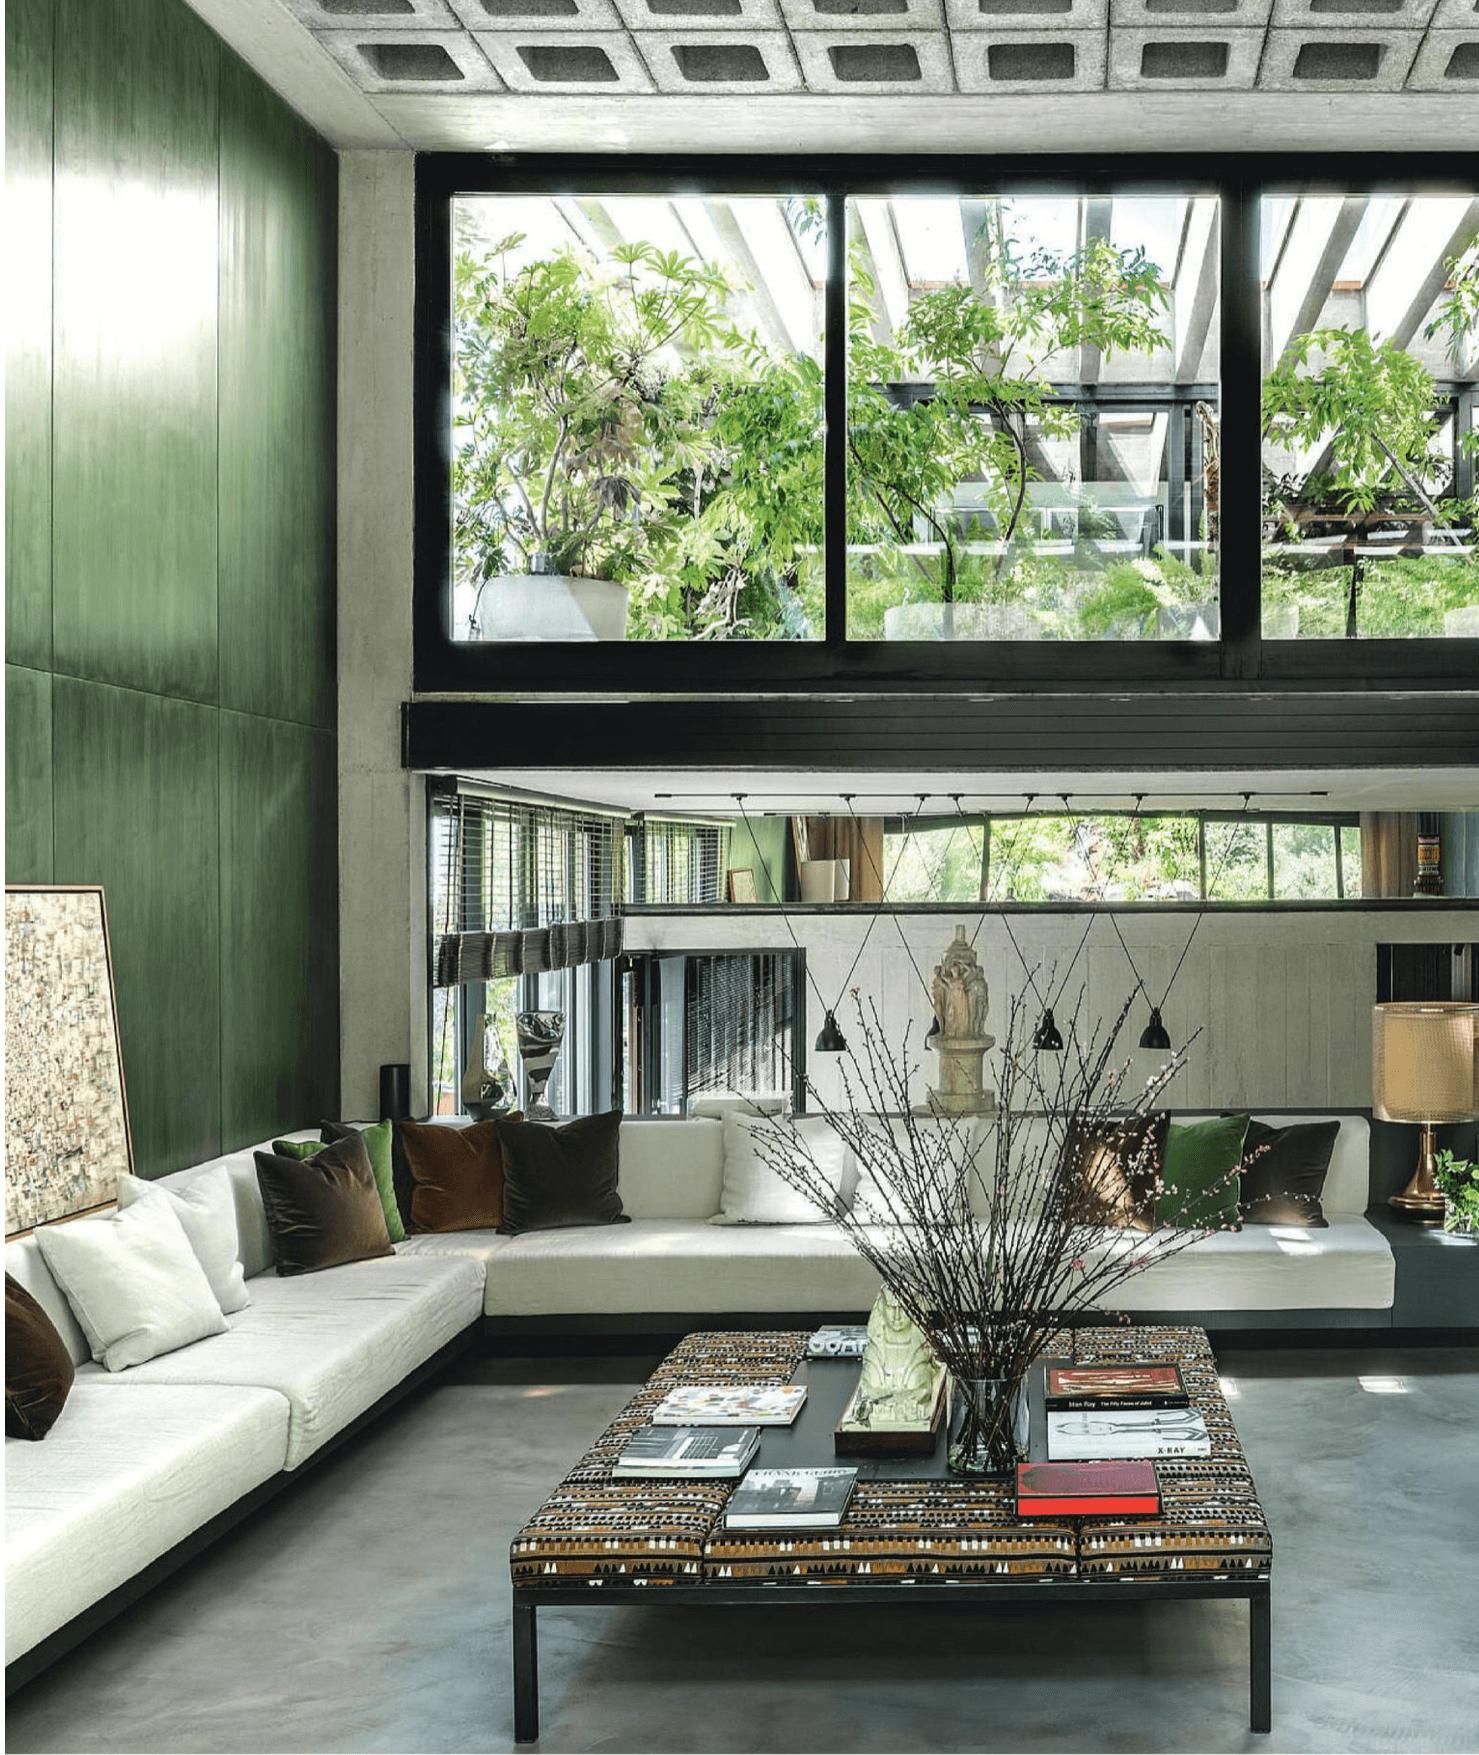 Moss Green paneled wall; Lobby; Living Room